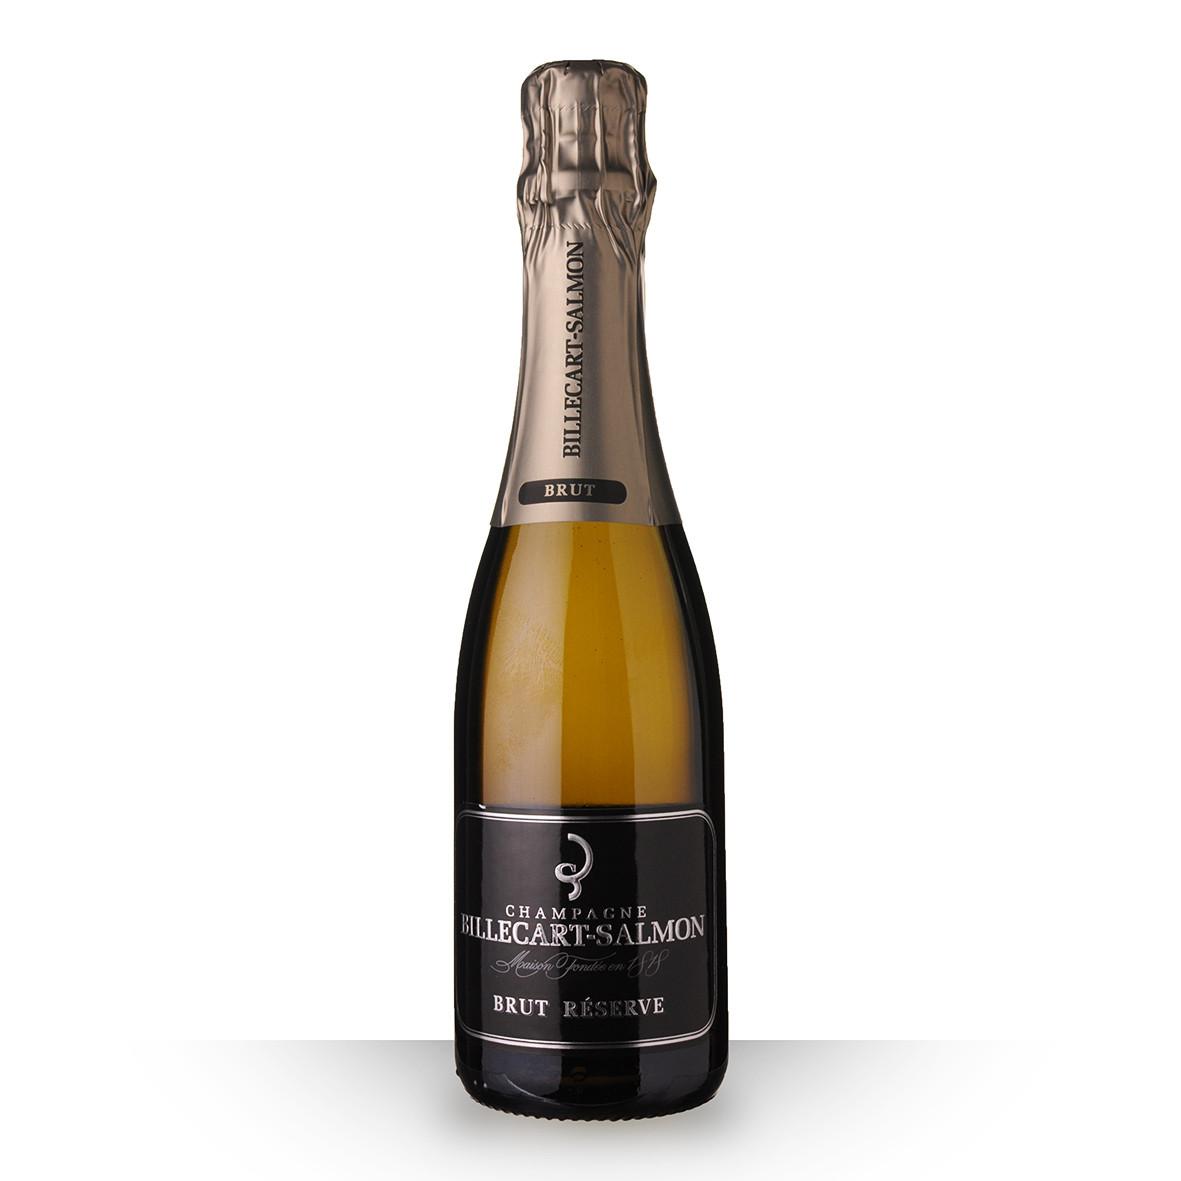 Champagne Billecart-Salmon Brut Réserve 37,5cl www.odyssee-vins.com